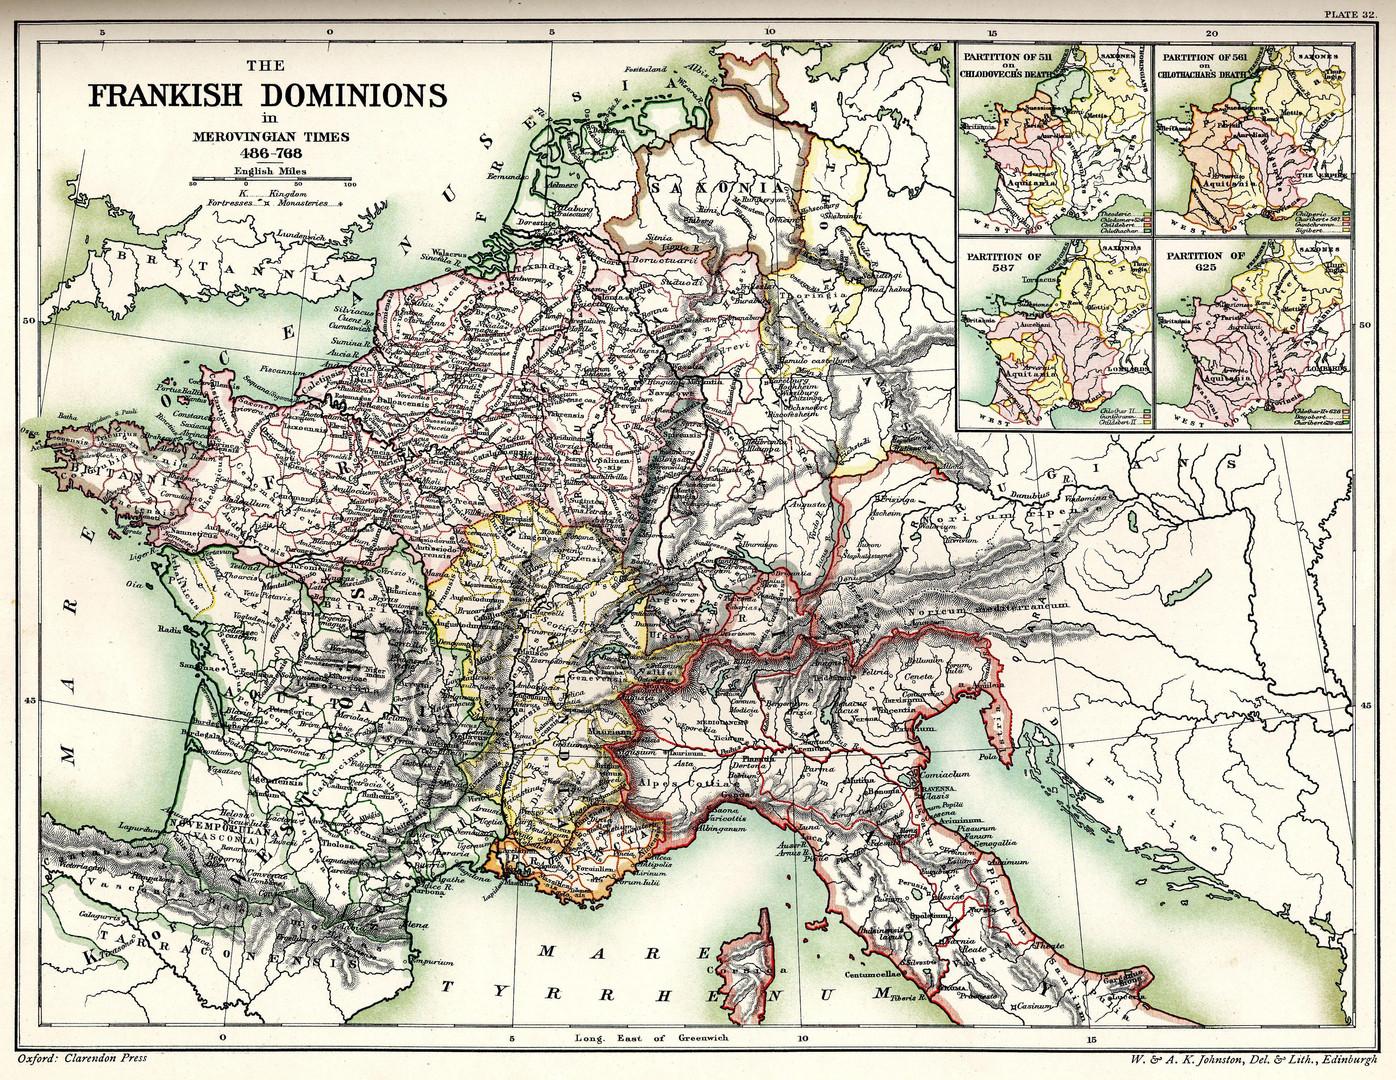 The Frankish Dominions